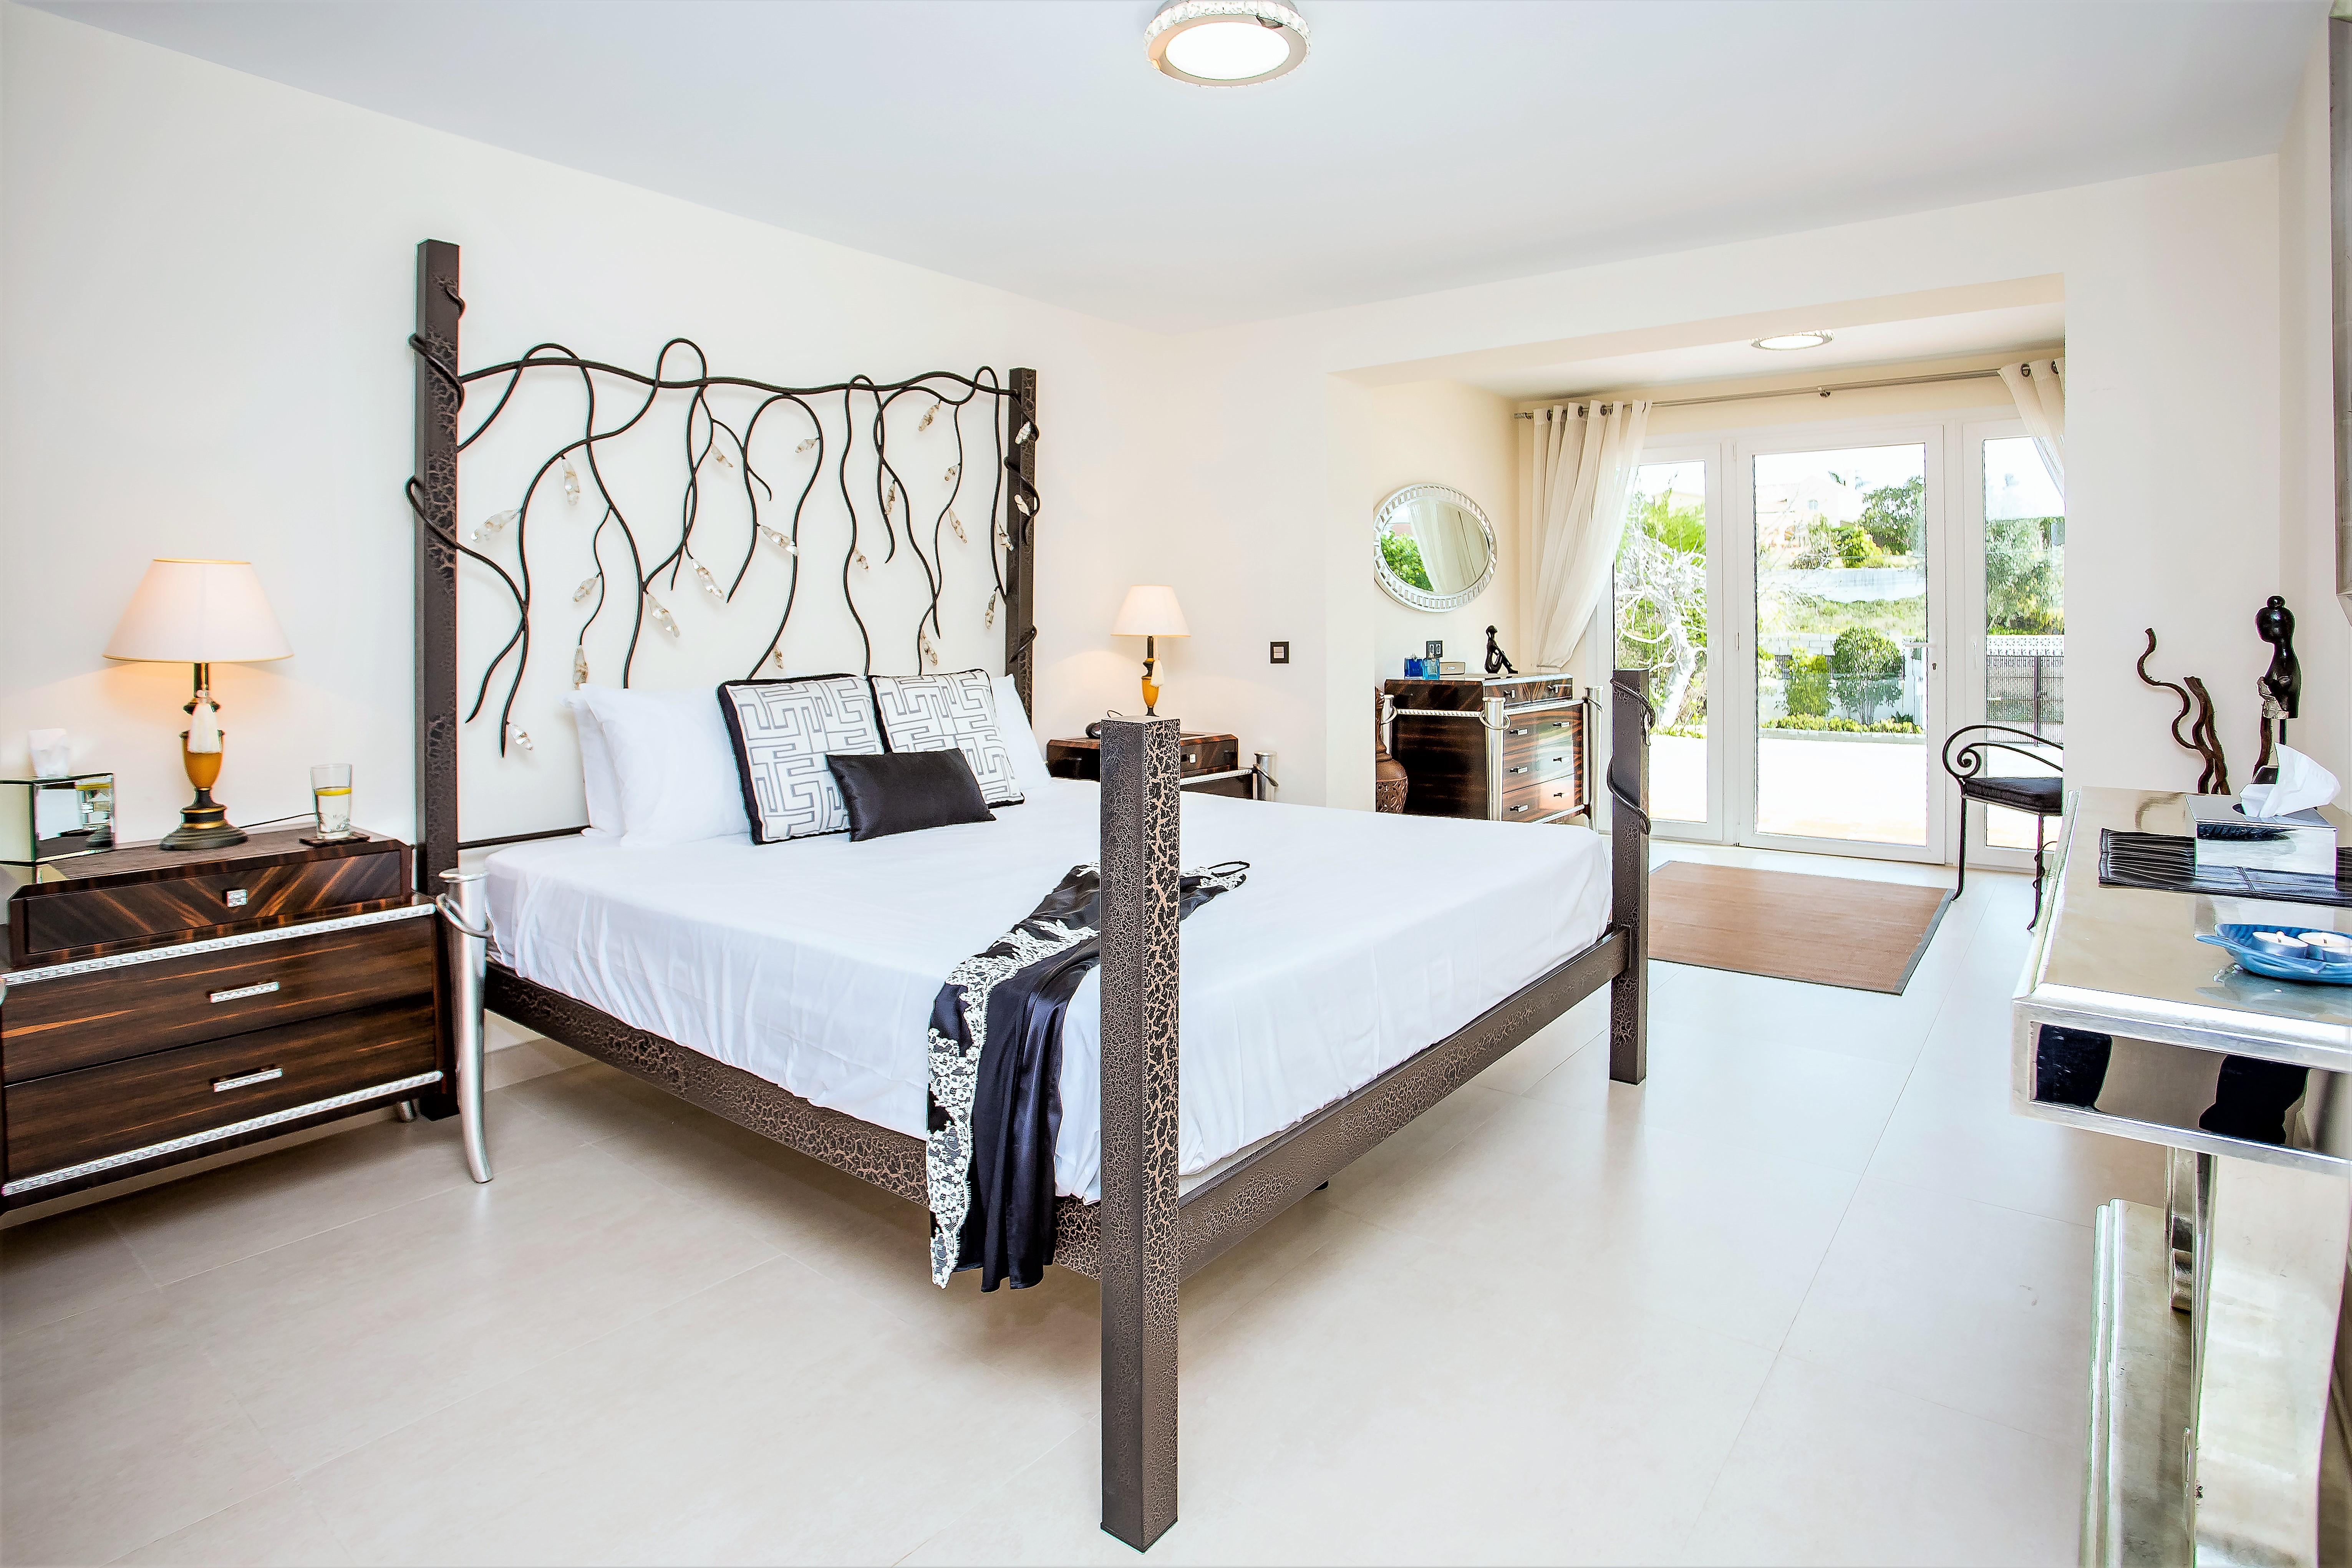 Apartment 4 B R  VILLA by Puerto Banus   Sea 5 m                                photo 20147466